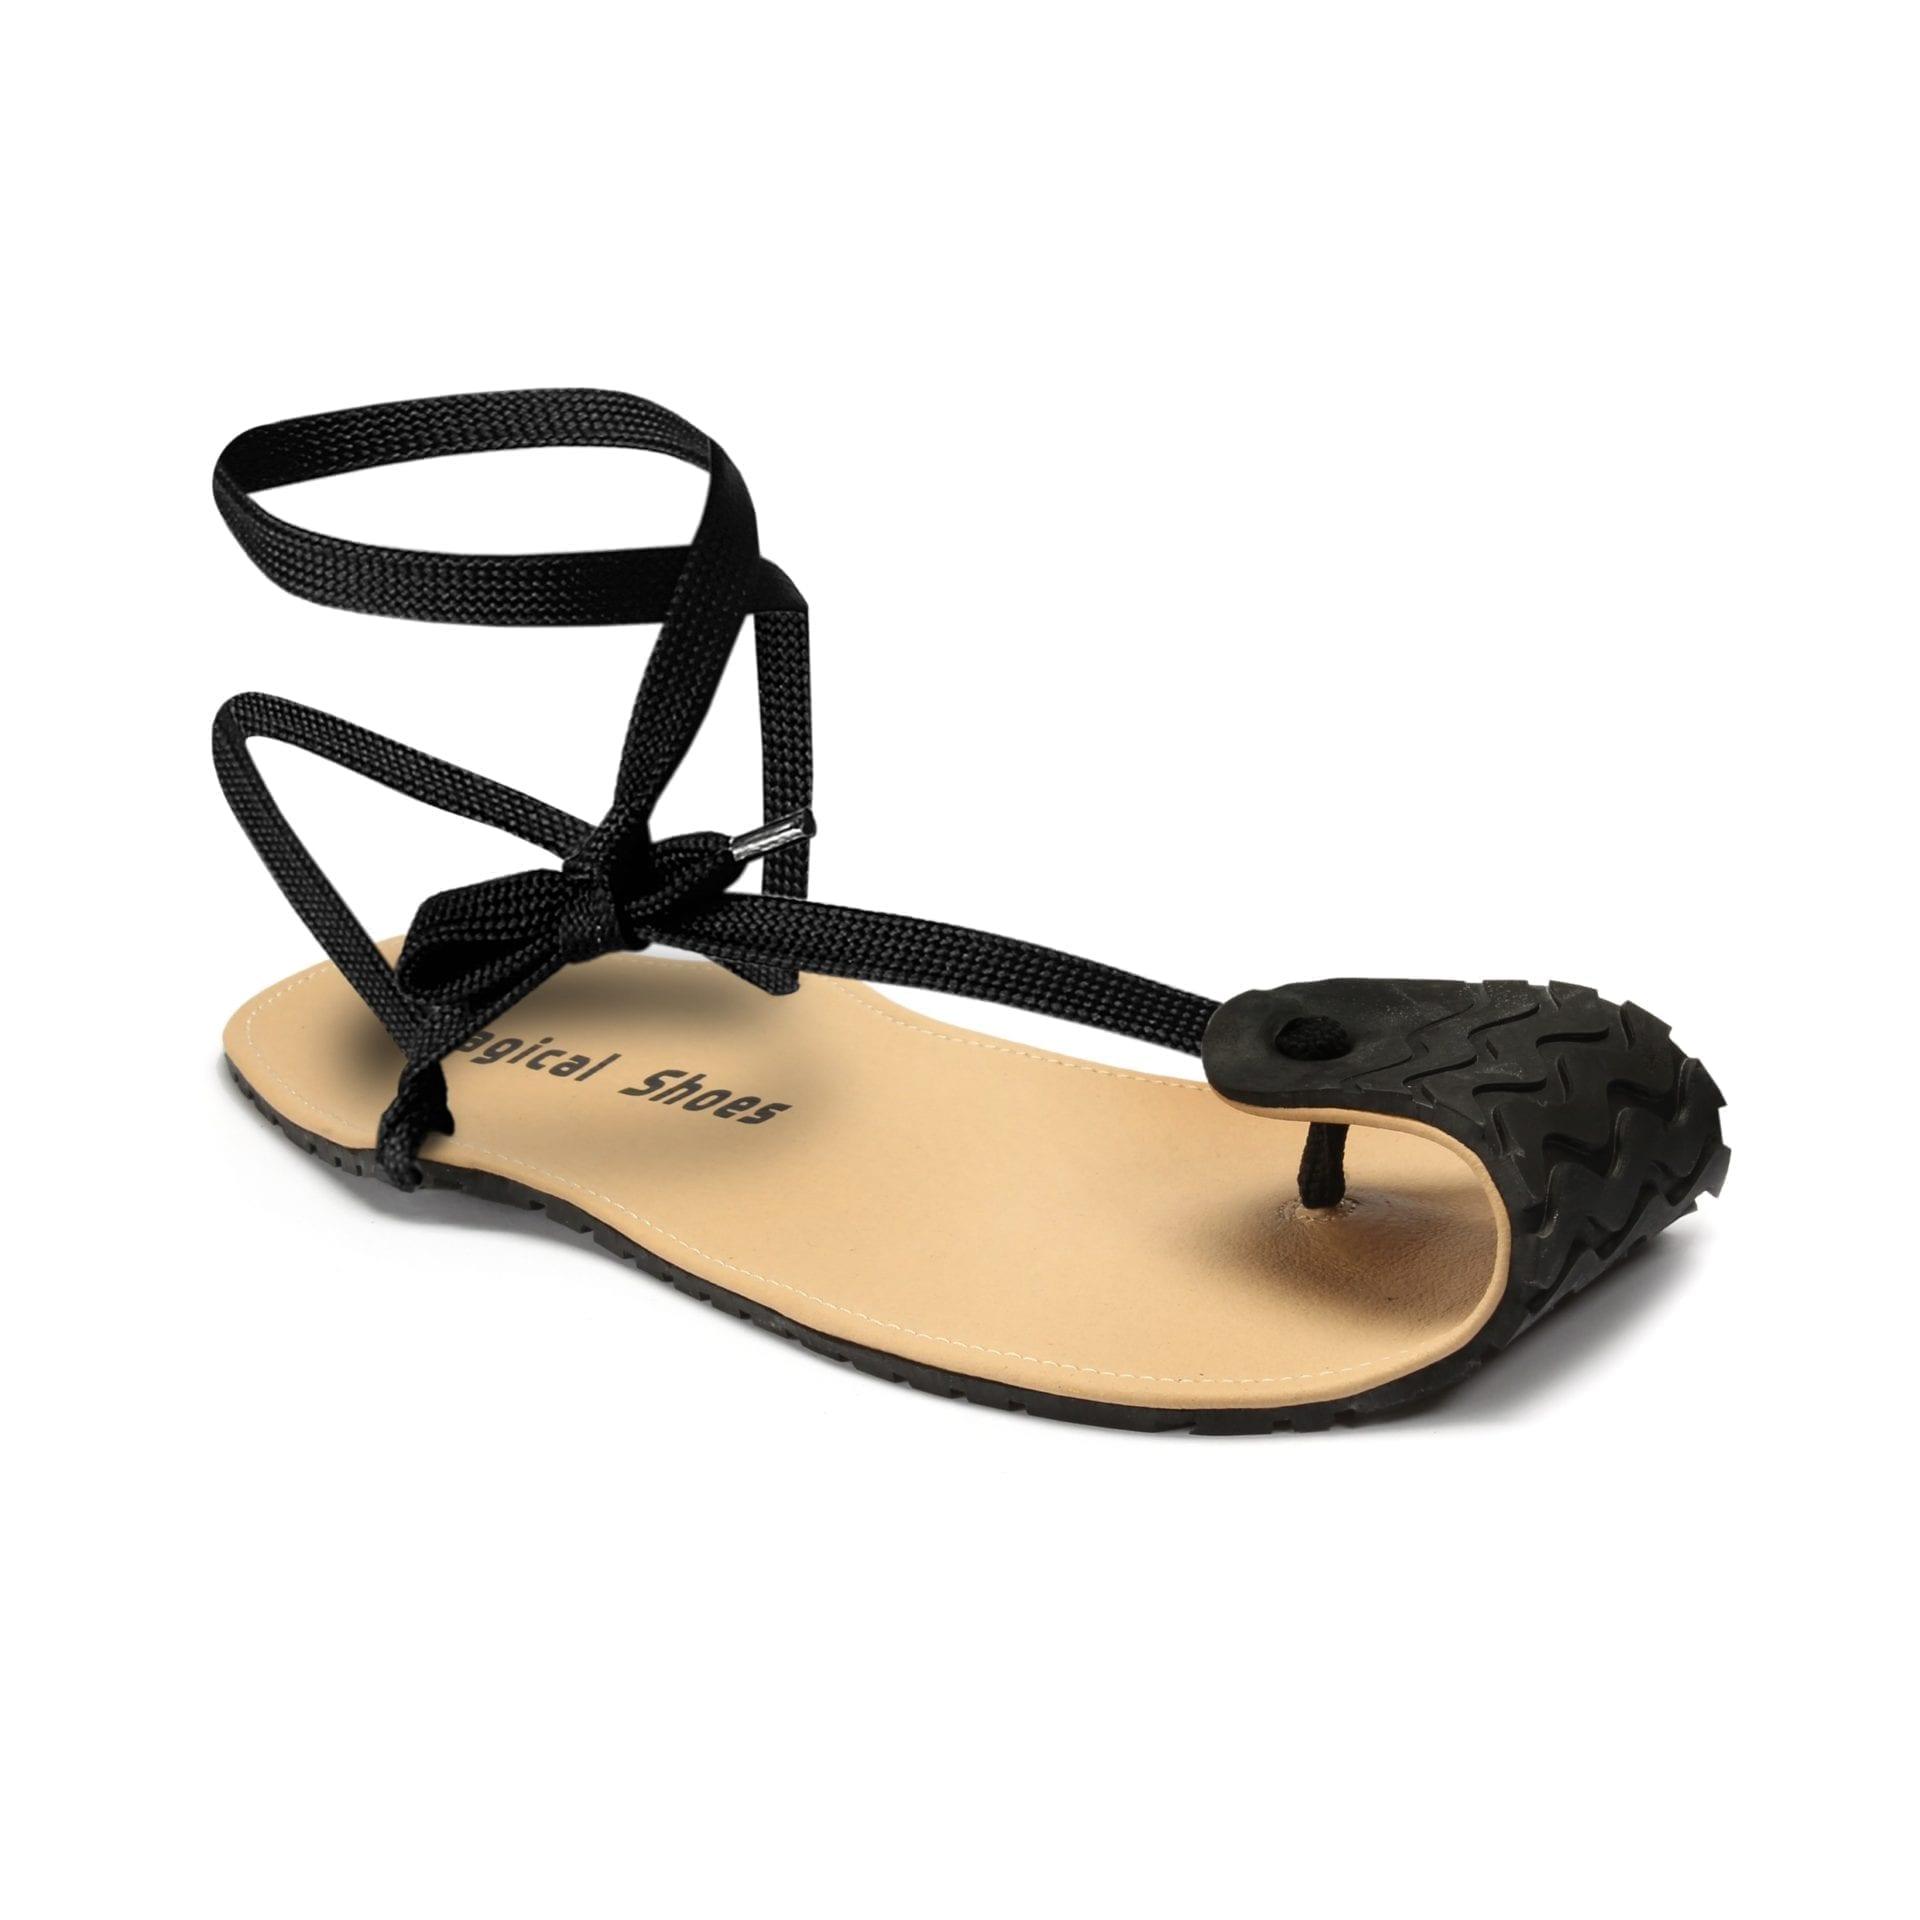 Barfußsandale Renn-Sandale hurache Barfußschuh-Hersteller Magical Shoes Caballo Blanco